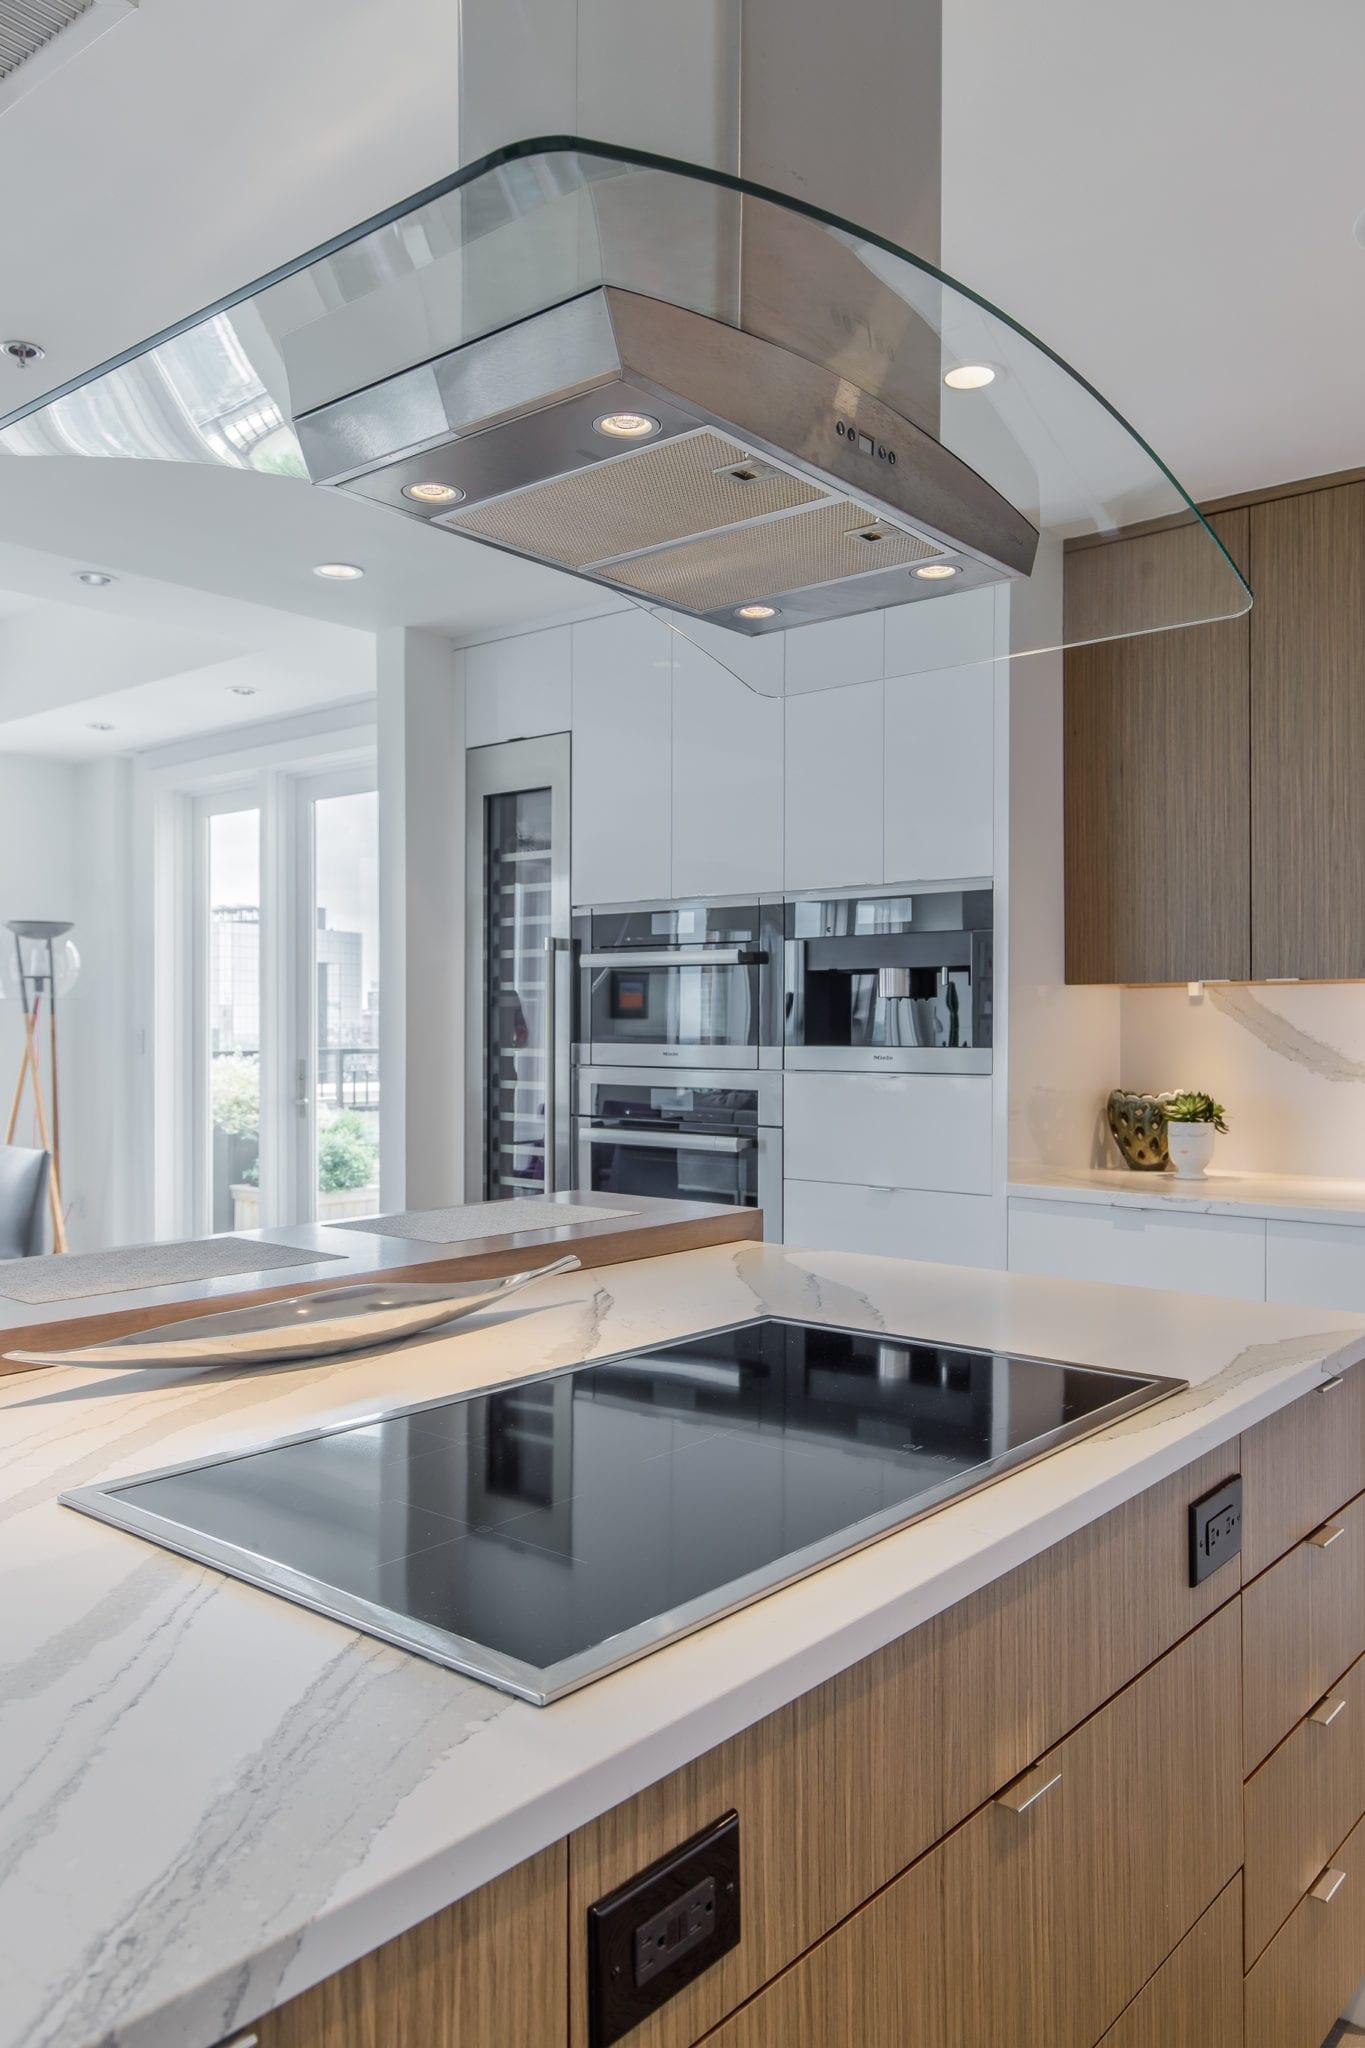 Penthouse Kitchen Island